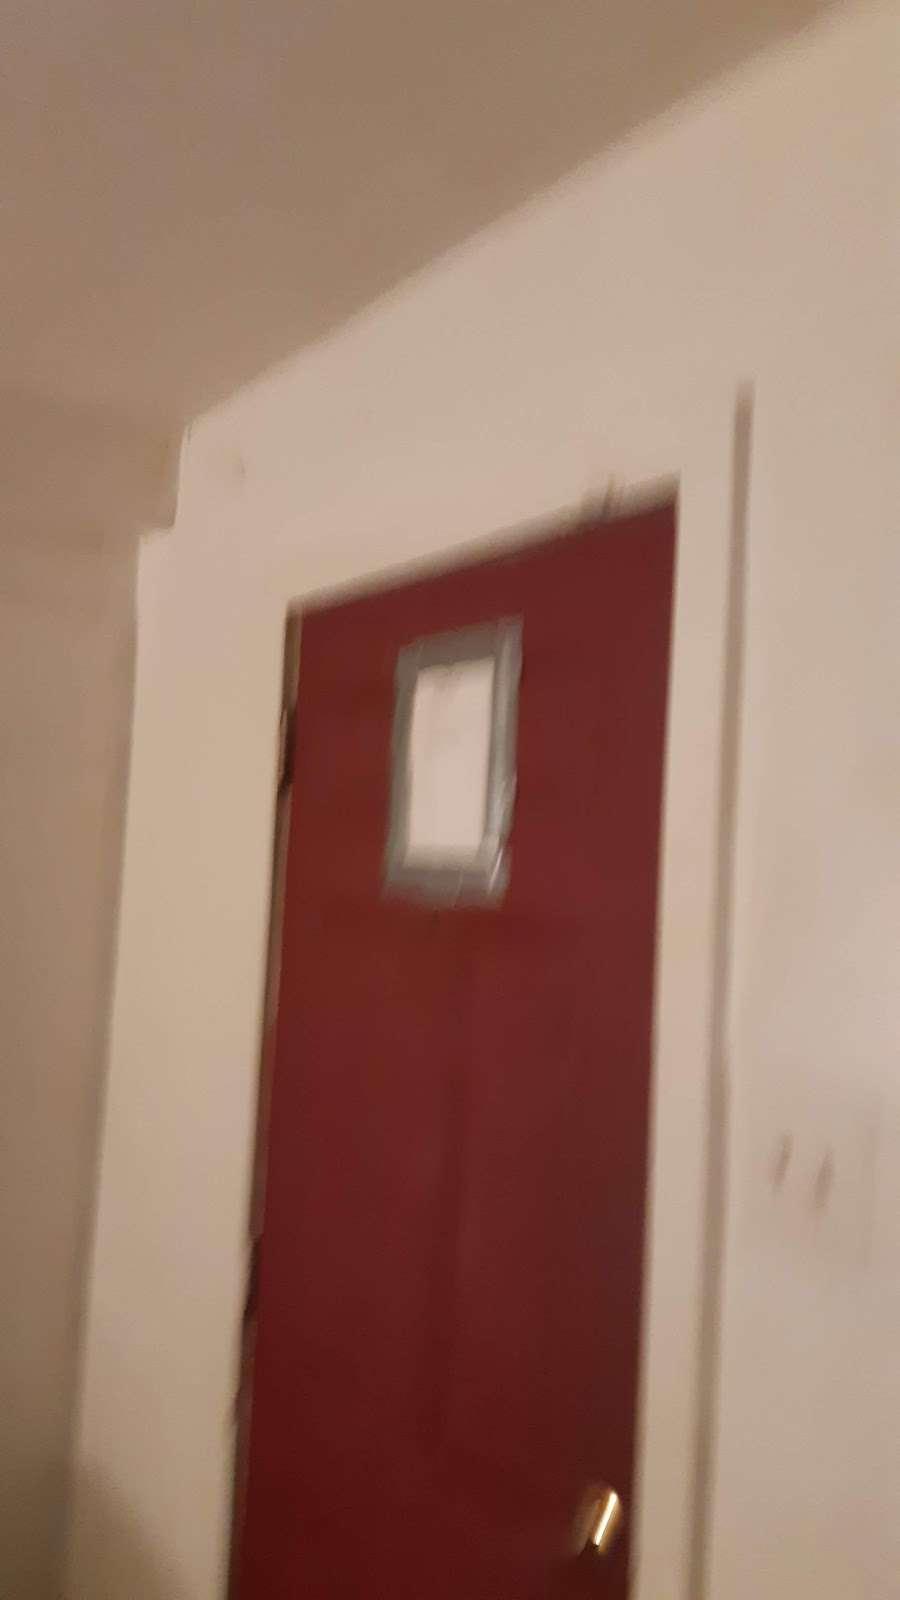 Atco Motel - lodging  | Photo 5 of 10 | Address: 795 White Horse Pike, Atco, NJ 08004, USA | Phone: (856) 719-8550